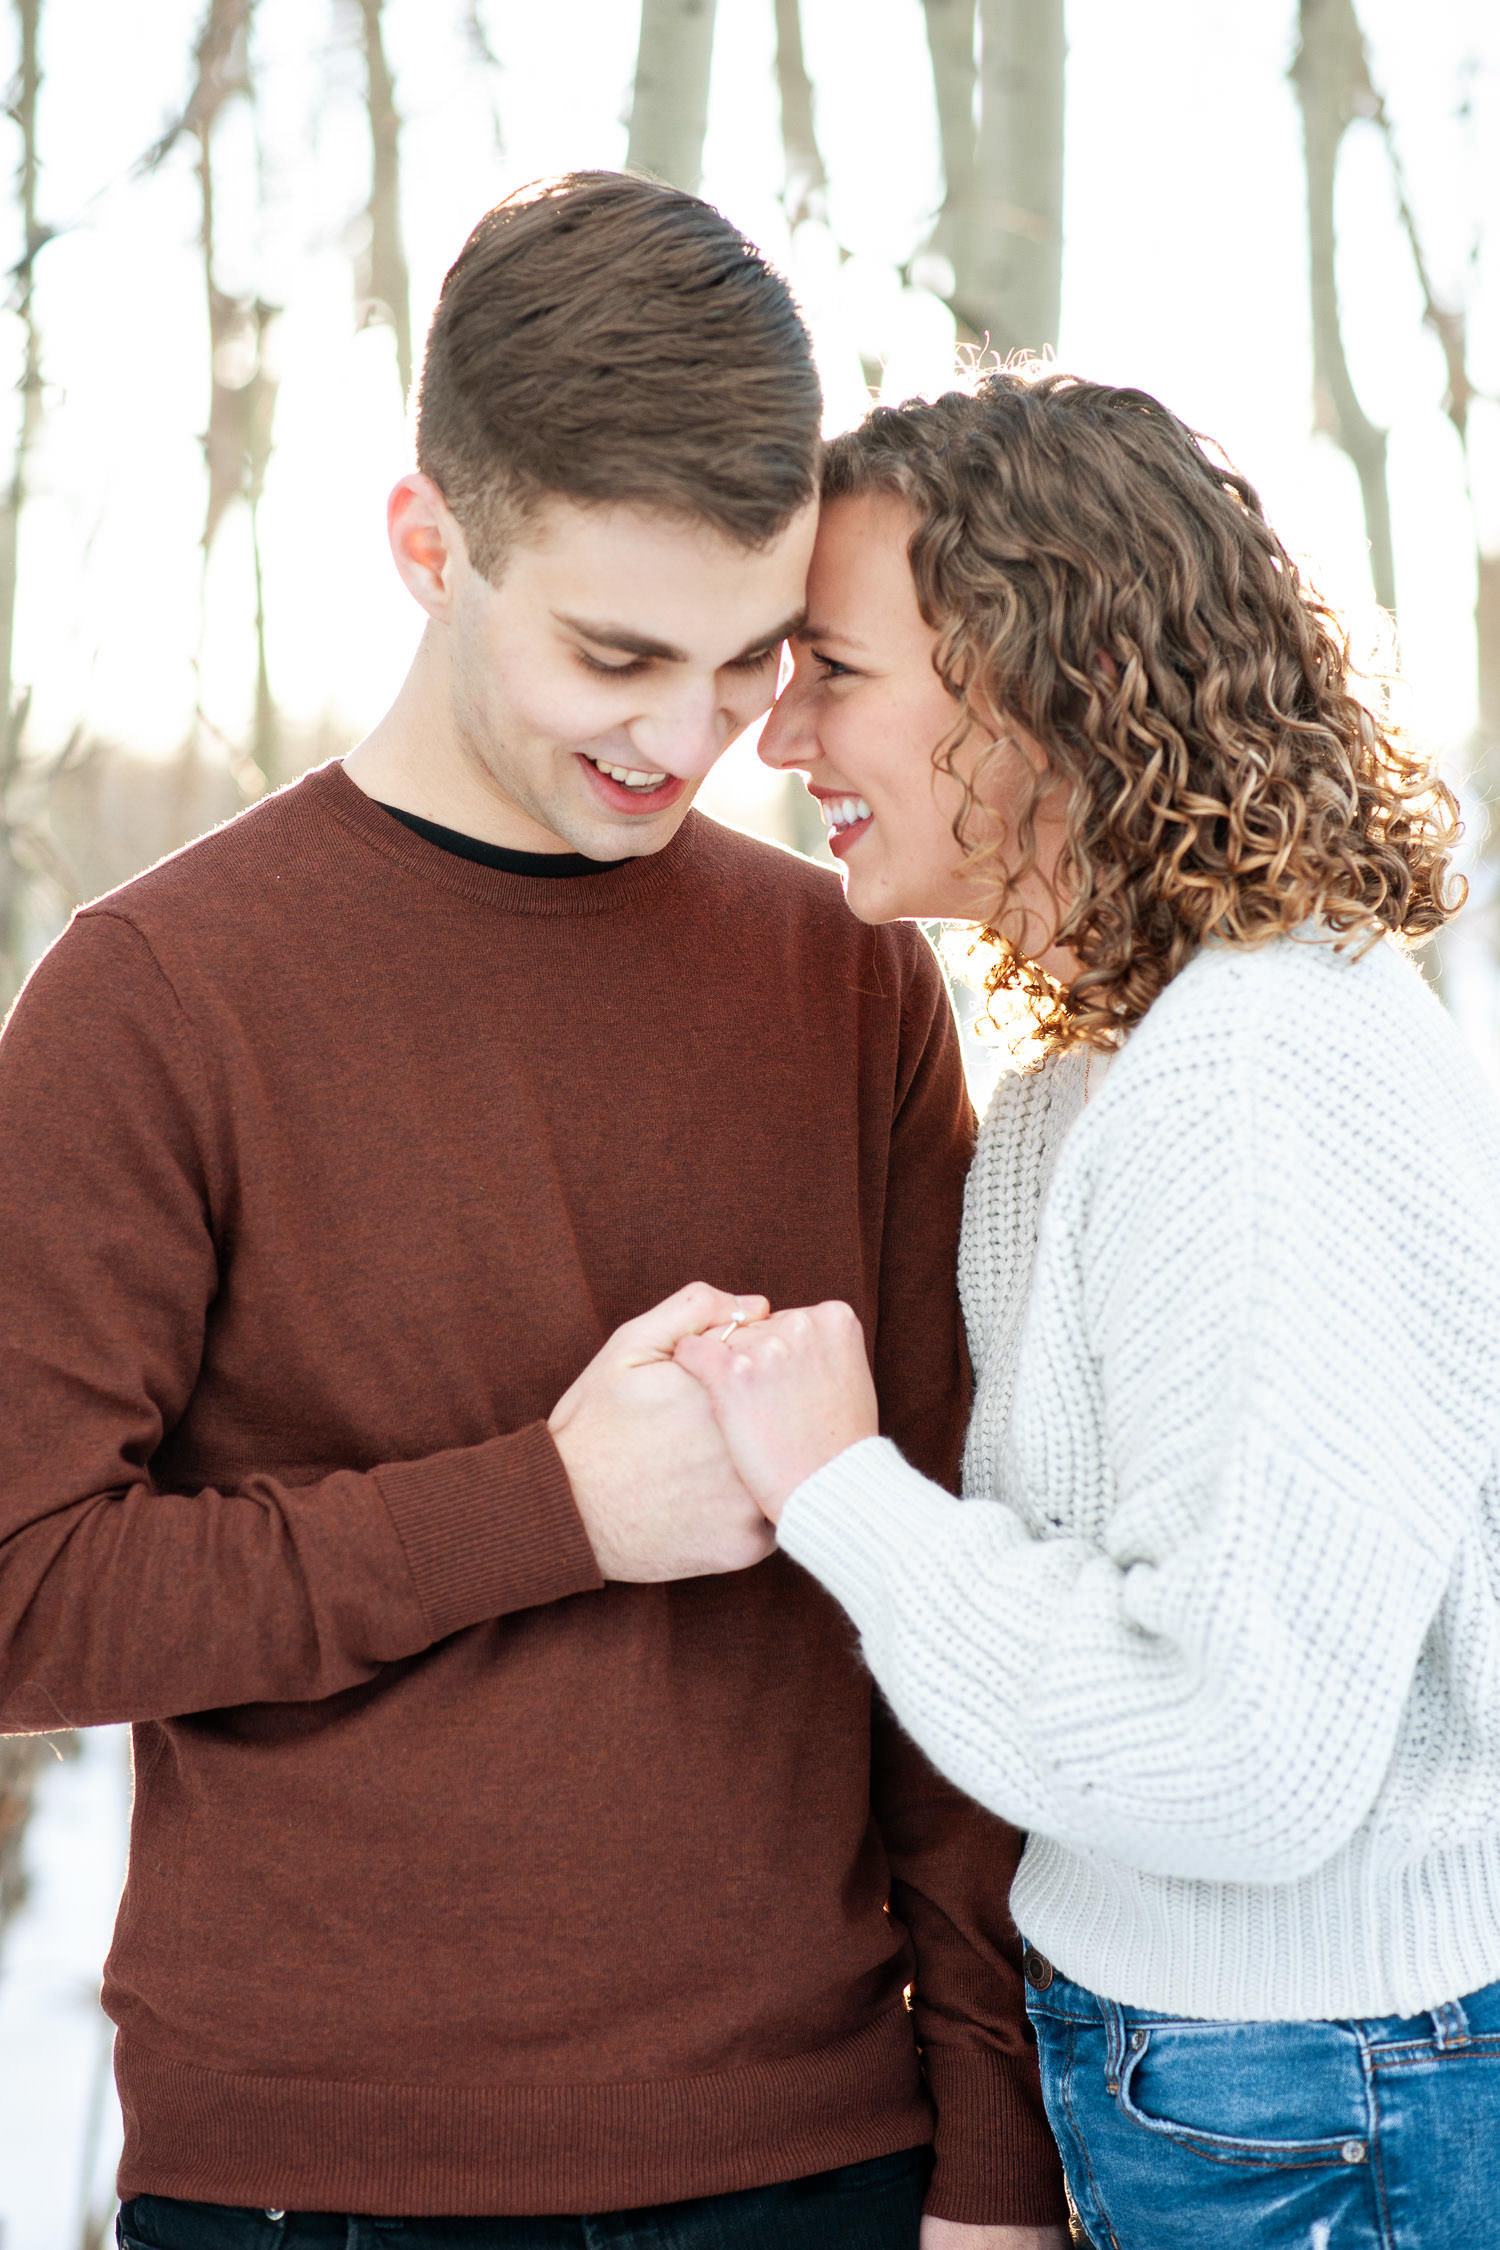 Engagement session 101 with Calgary wedding photographer Tara Whittaker